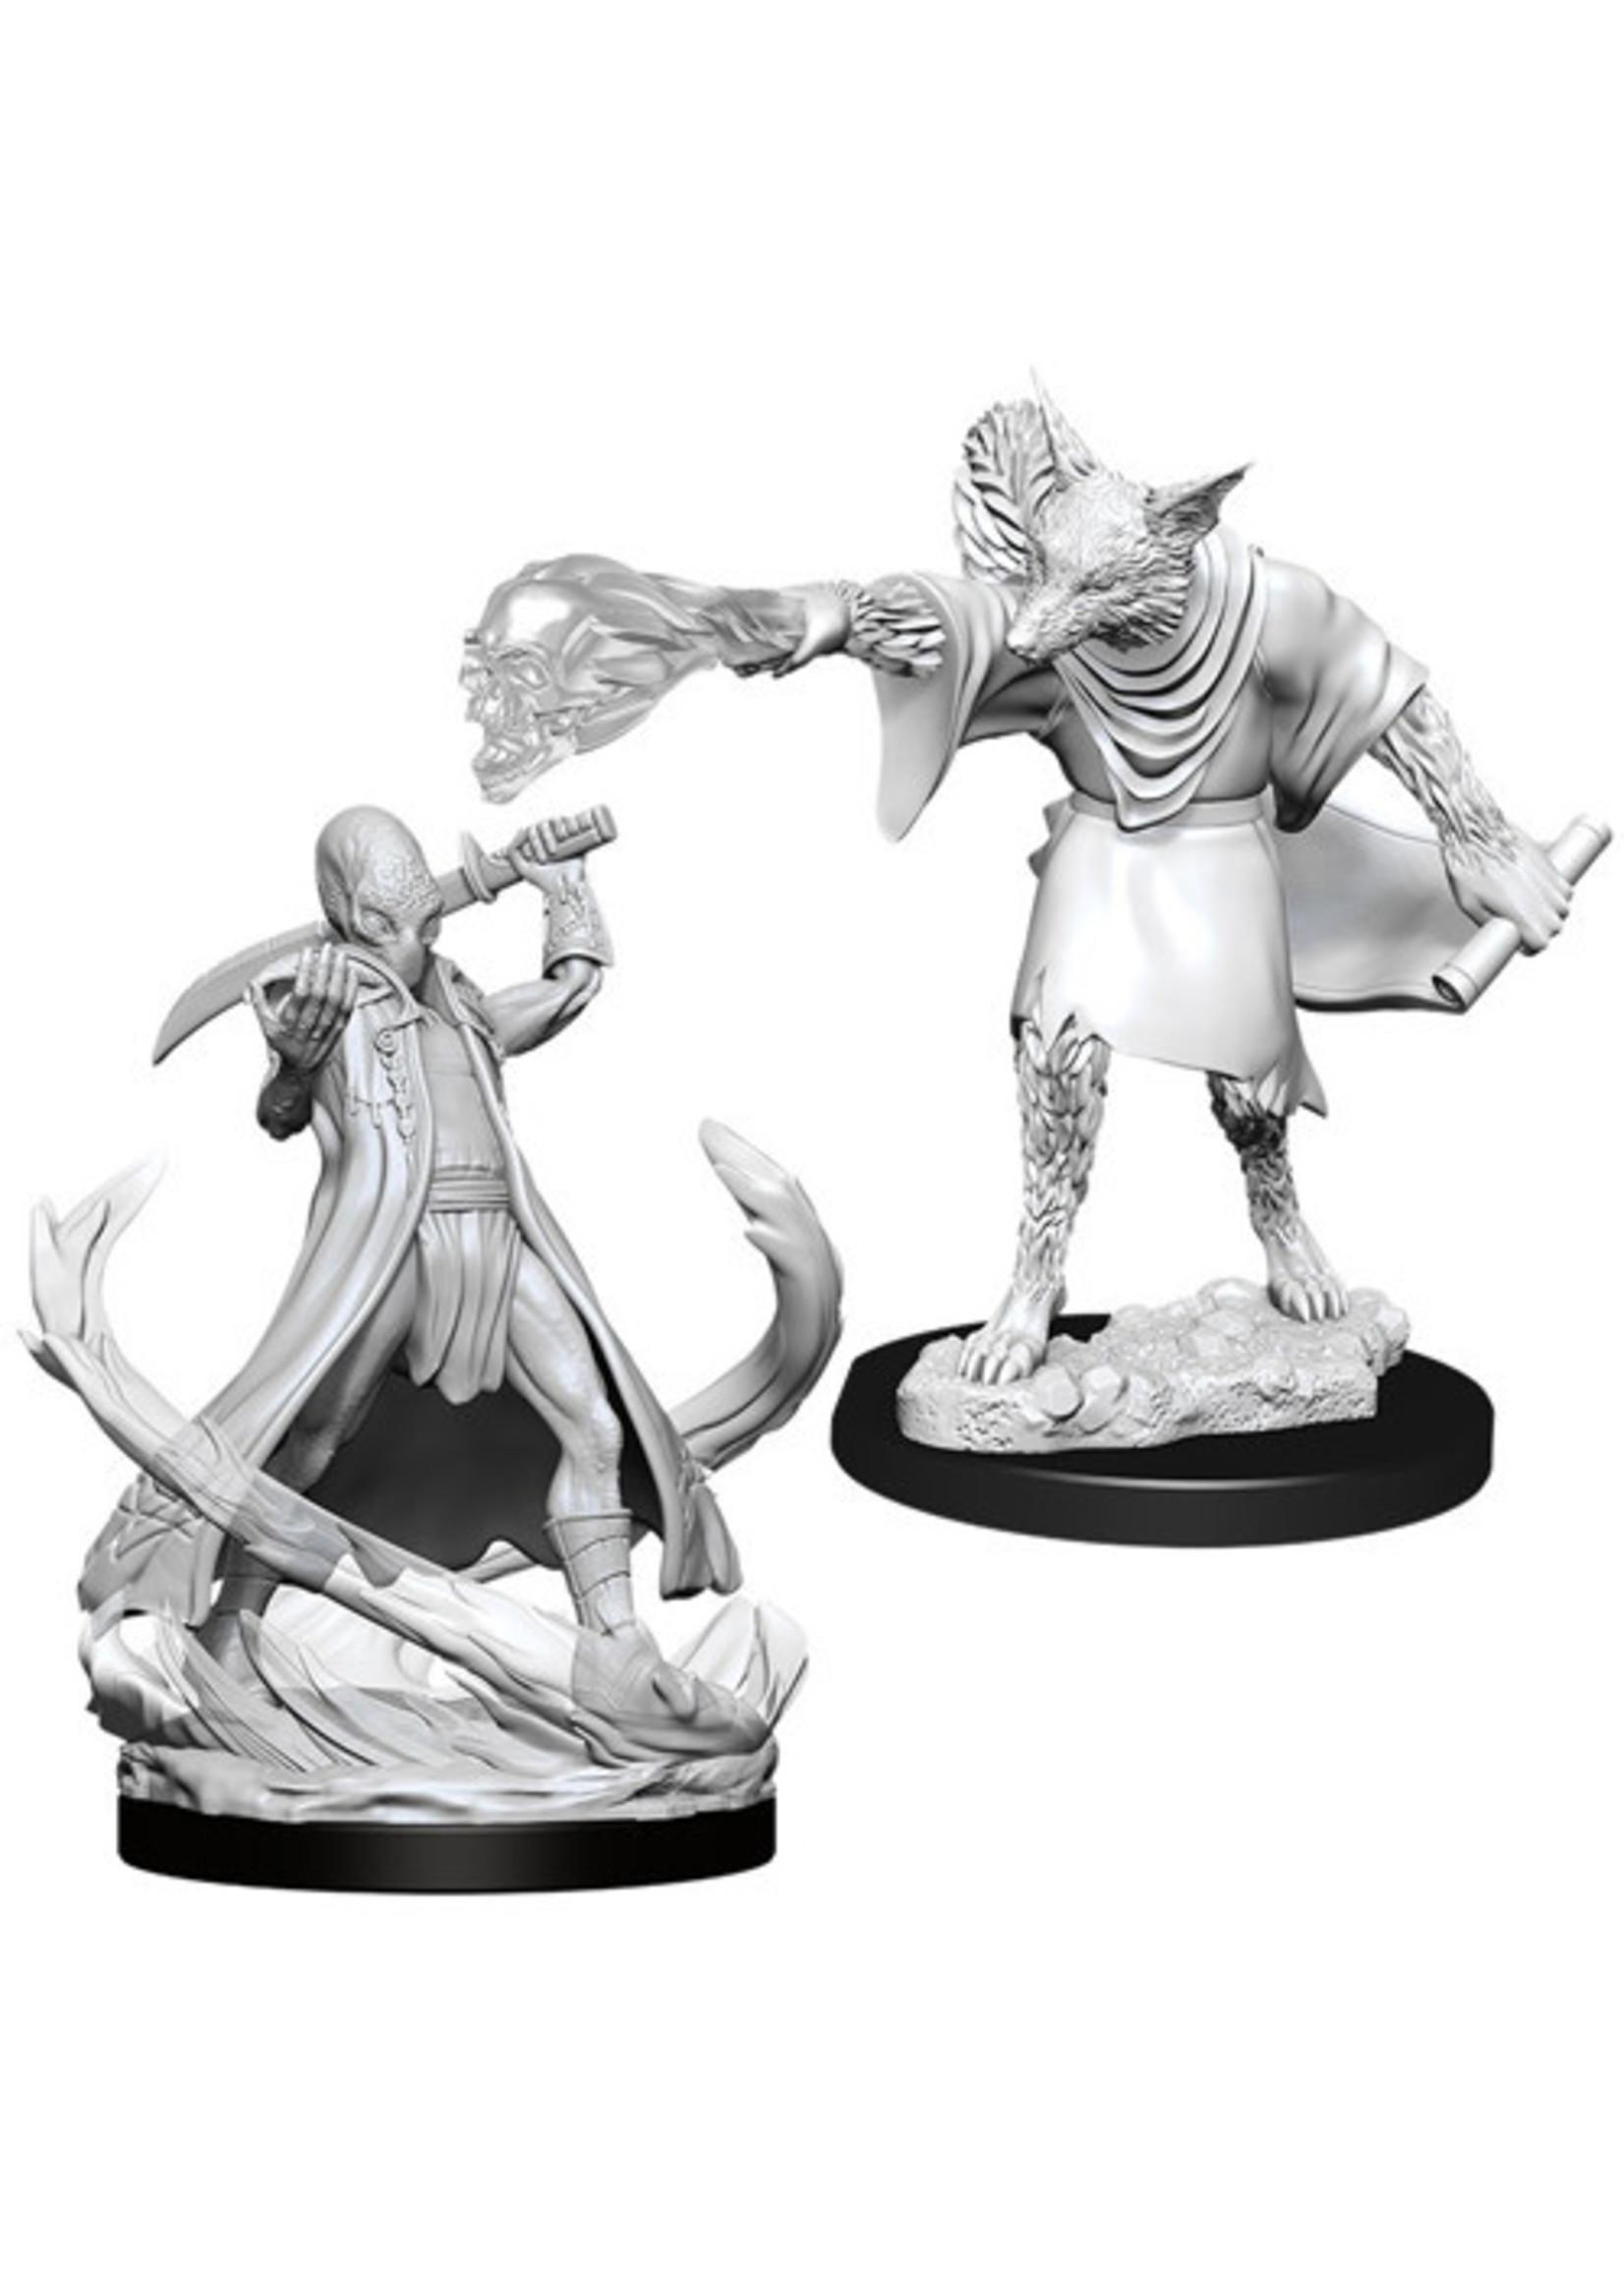 Dungeons & Dragons Nolzur`s Marvelous Unpainted Miniatures: W11 Arcanaloth & Ultroloth